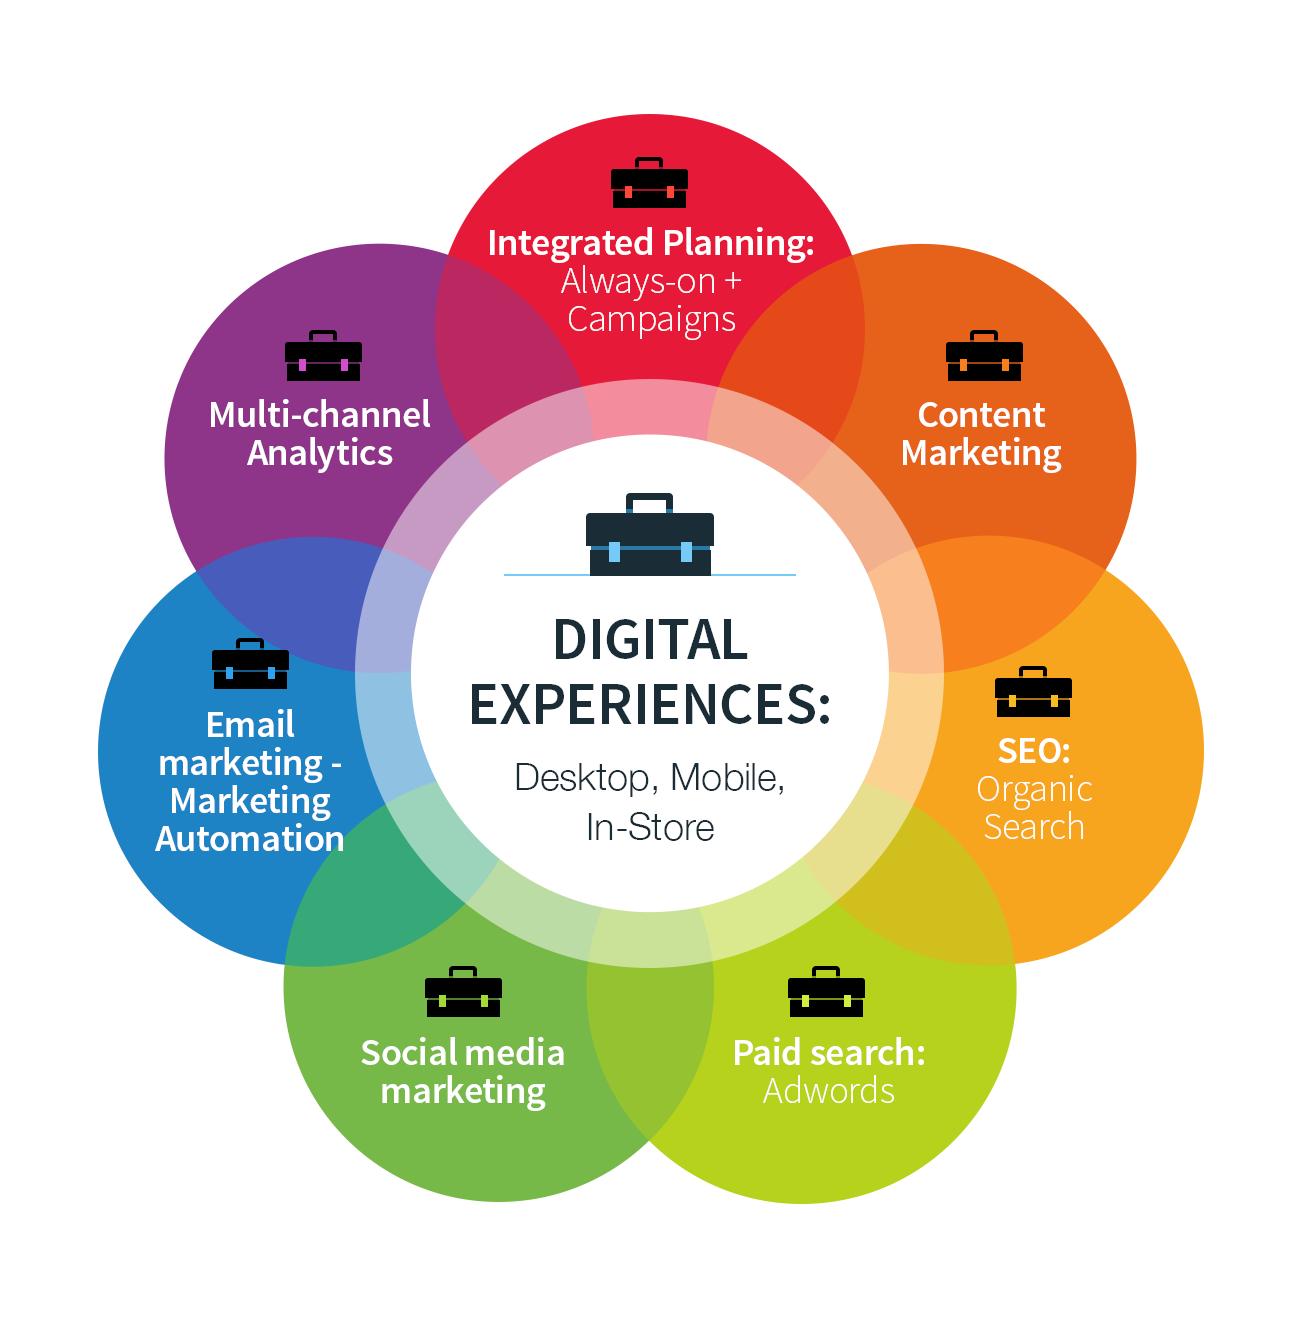 Digital Experiences